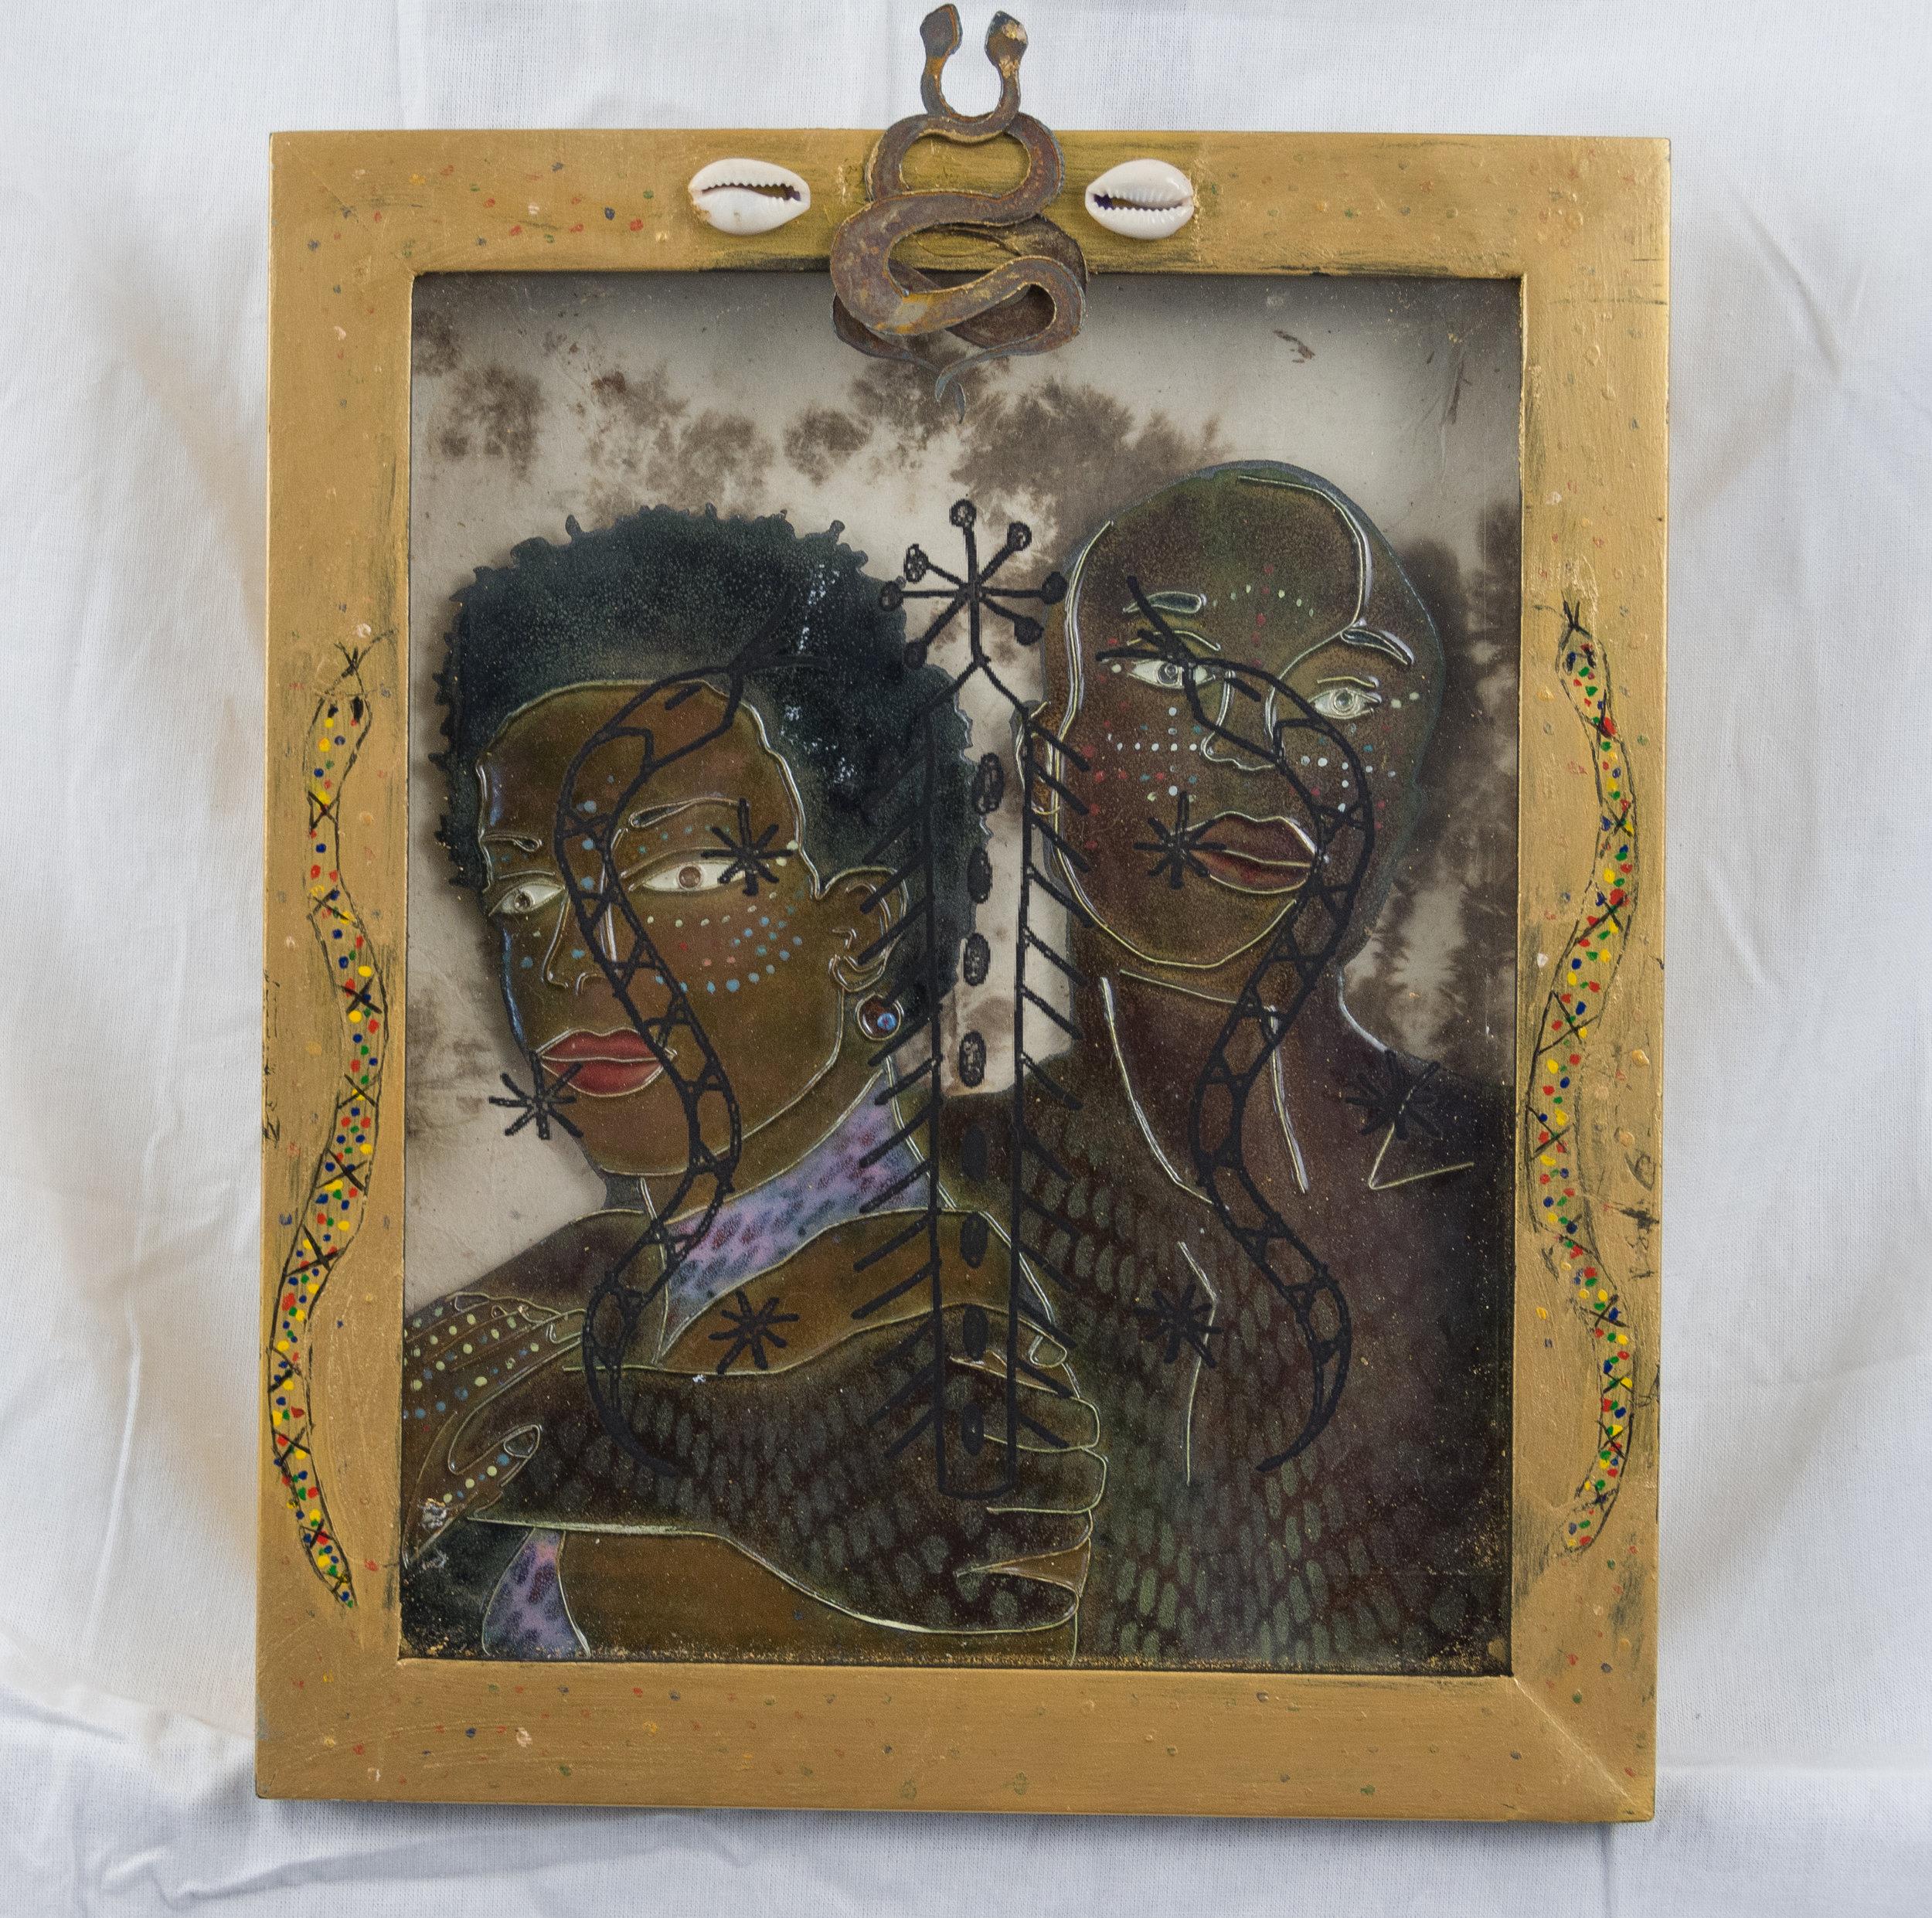 Damballah and Ayida Wedo, the Serpent and the Rainbow